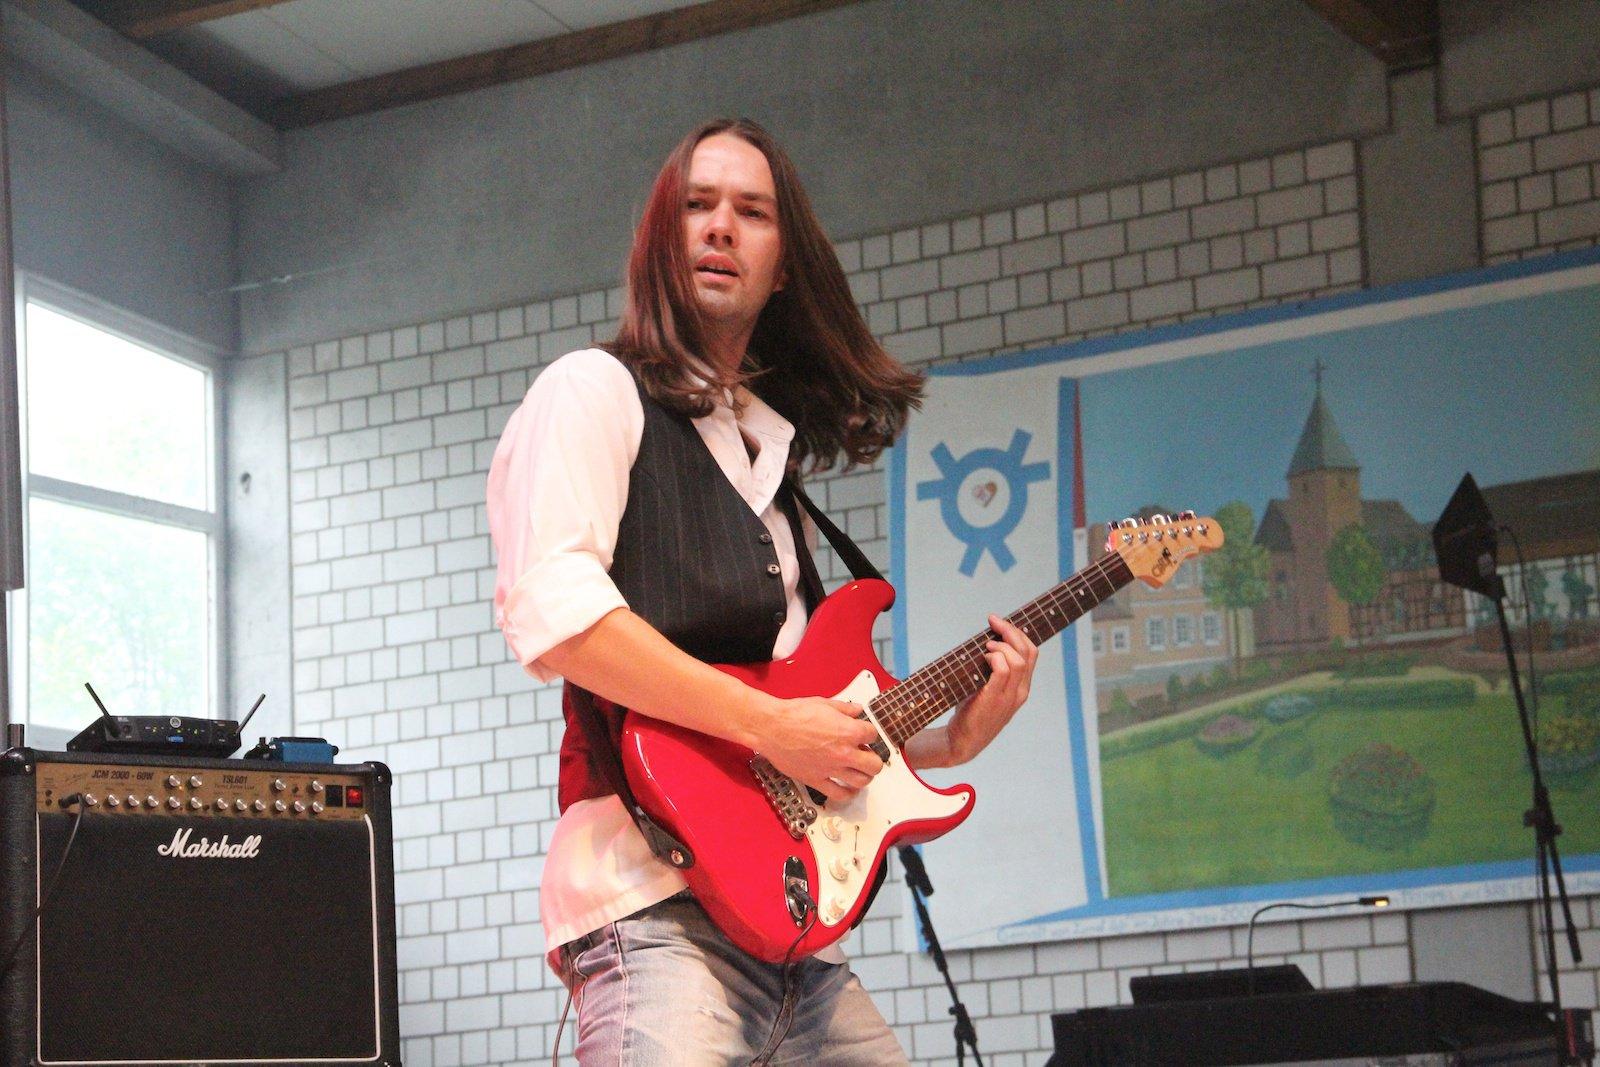 Stainless Quo - Sommerfesthalle, Otterstadt 18.06.2011 - 27